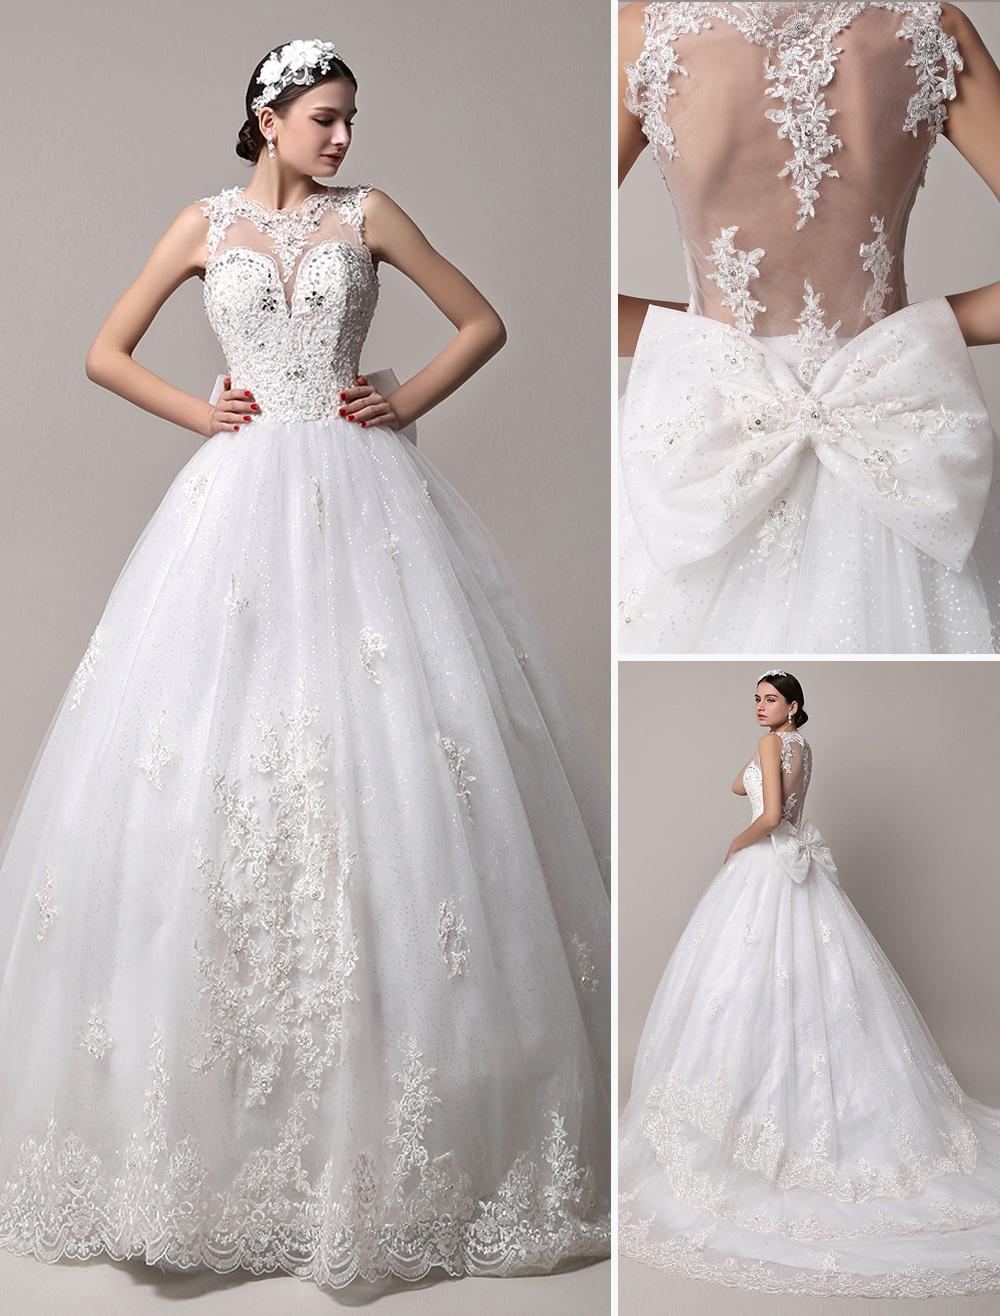 Glitter Sheer Back Chapel Train Wedding Gown with Heavily Beaded Bodice Milanoo